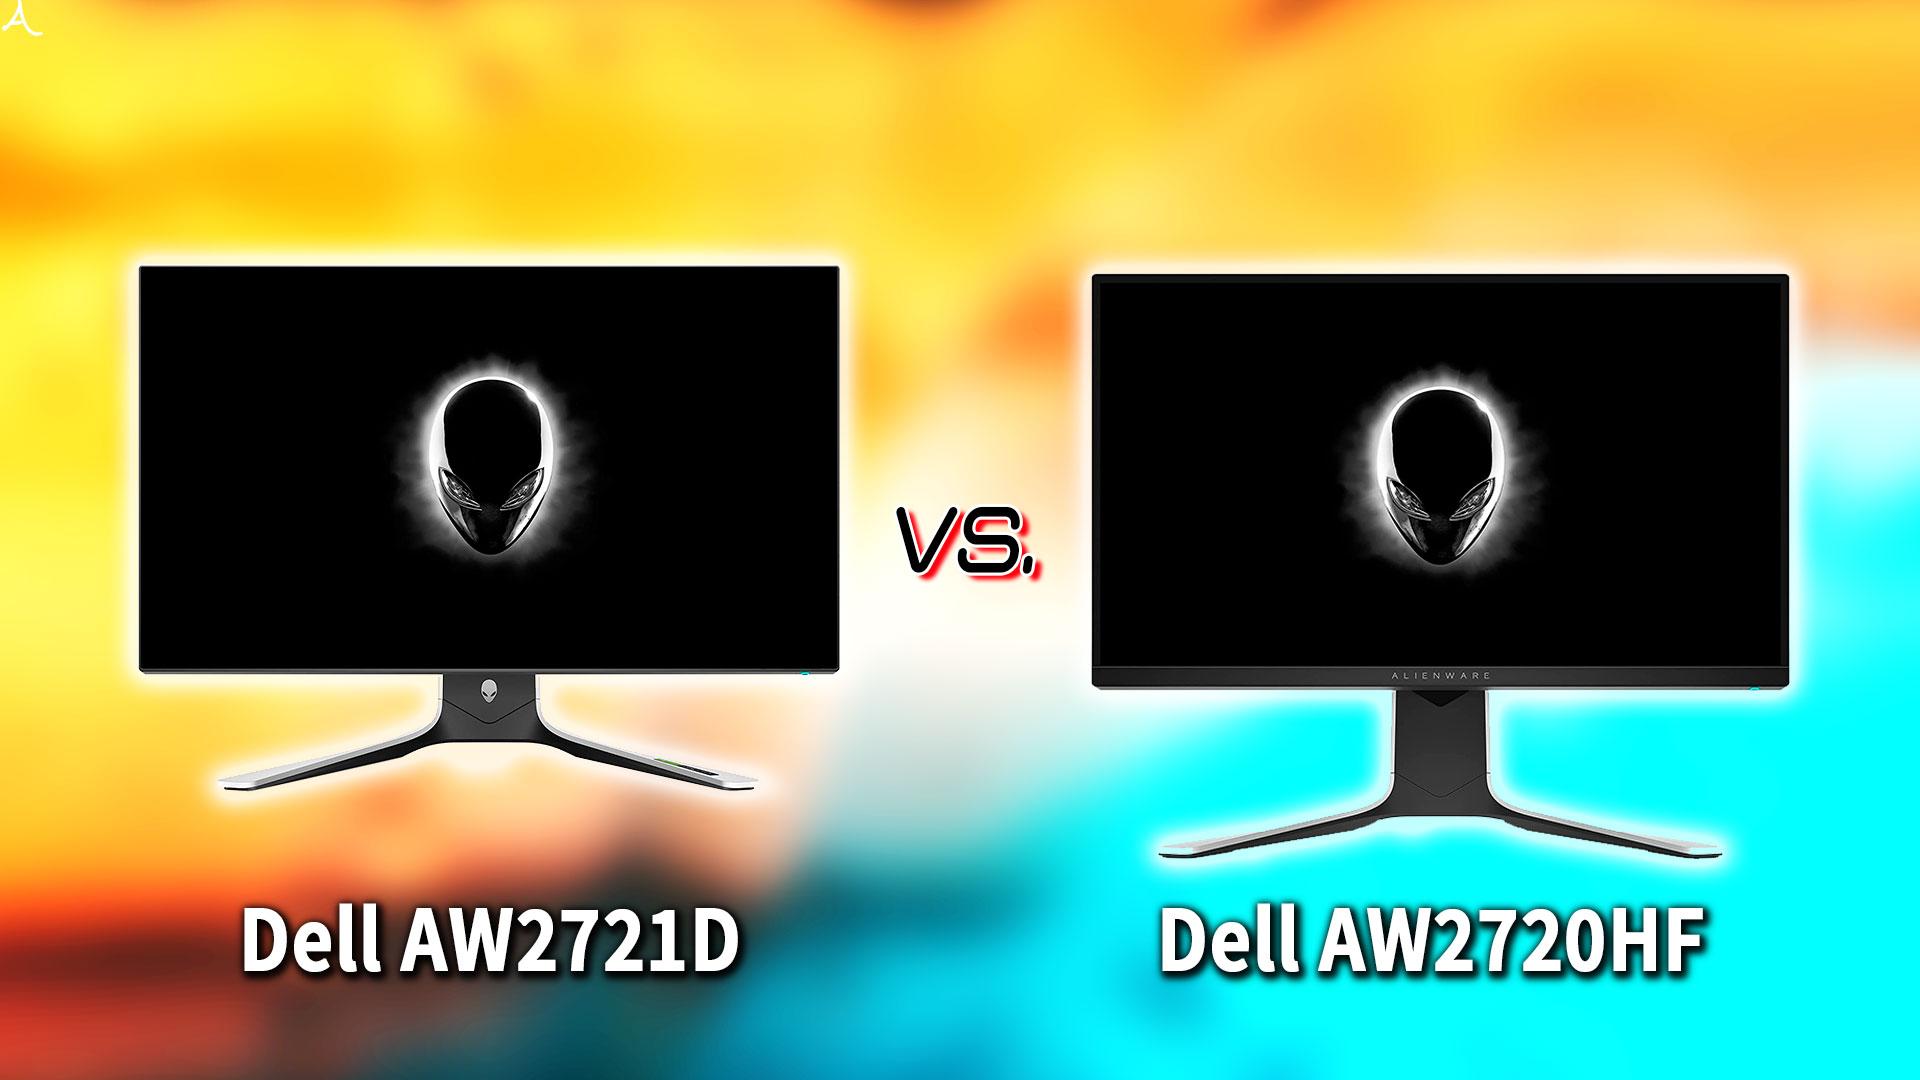 「Dell ALIENWARE AW2721D」と「AW2720HF」の違いを比較:どっちを買う?